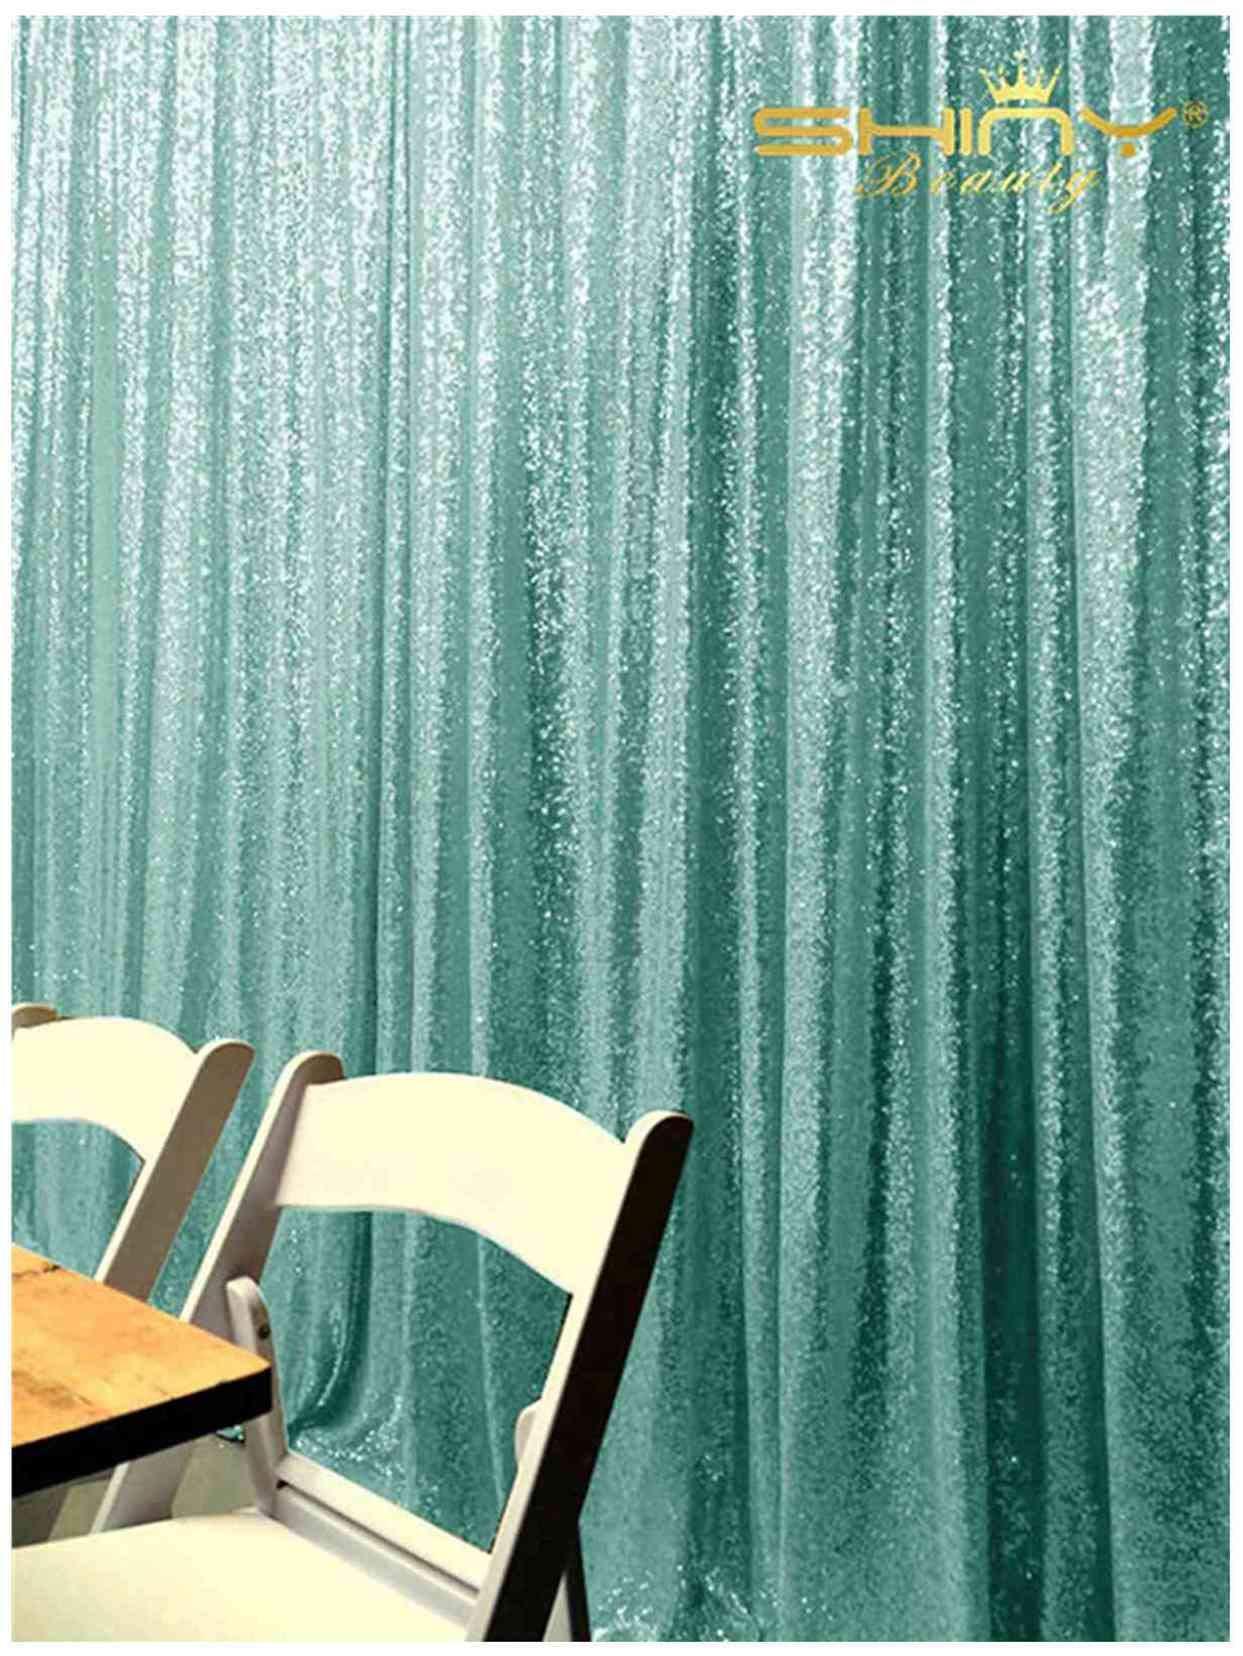 Backdrop Curtains 4FTx7FT Happy Birthday Backdrop Prince Teal Sequin Backdrop Y1108